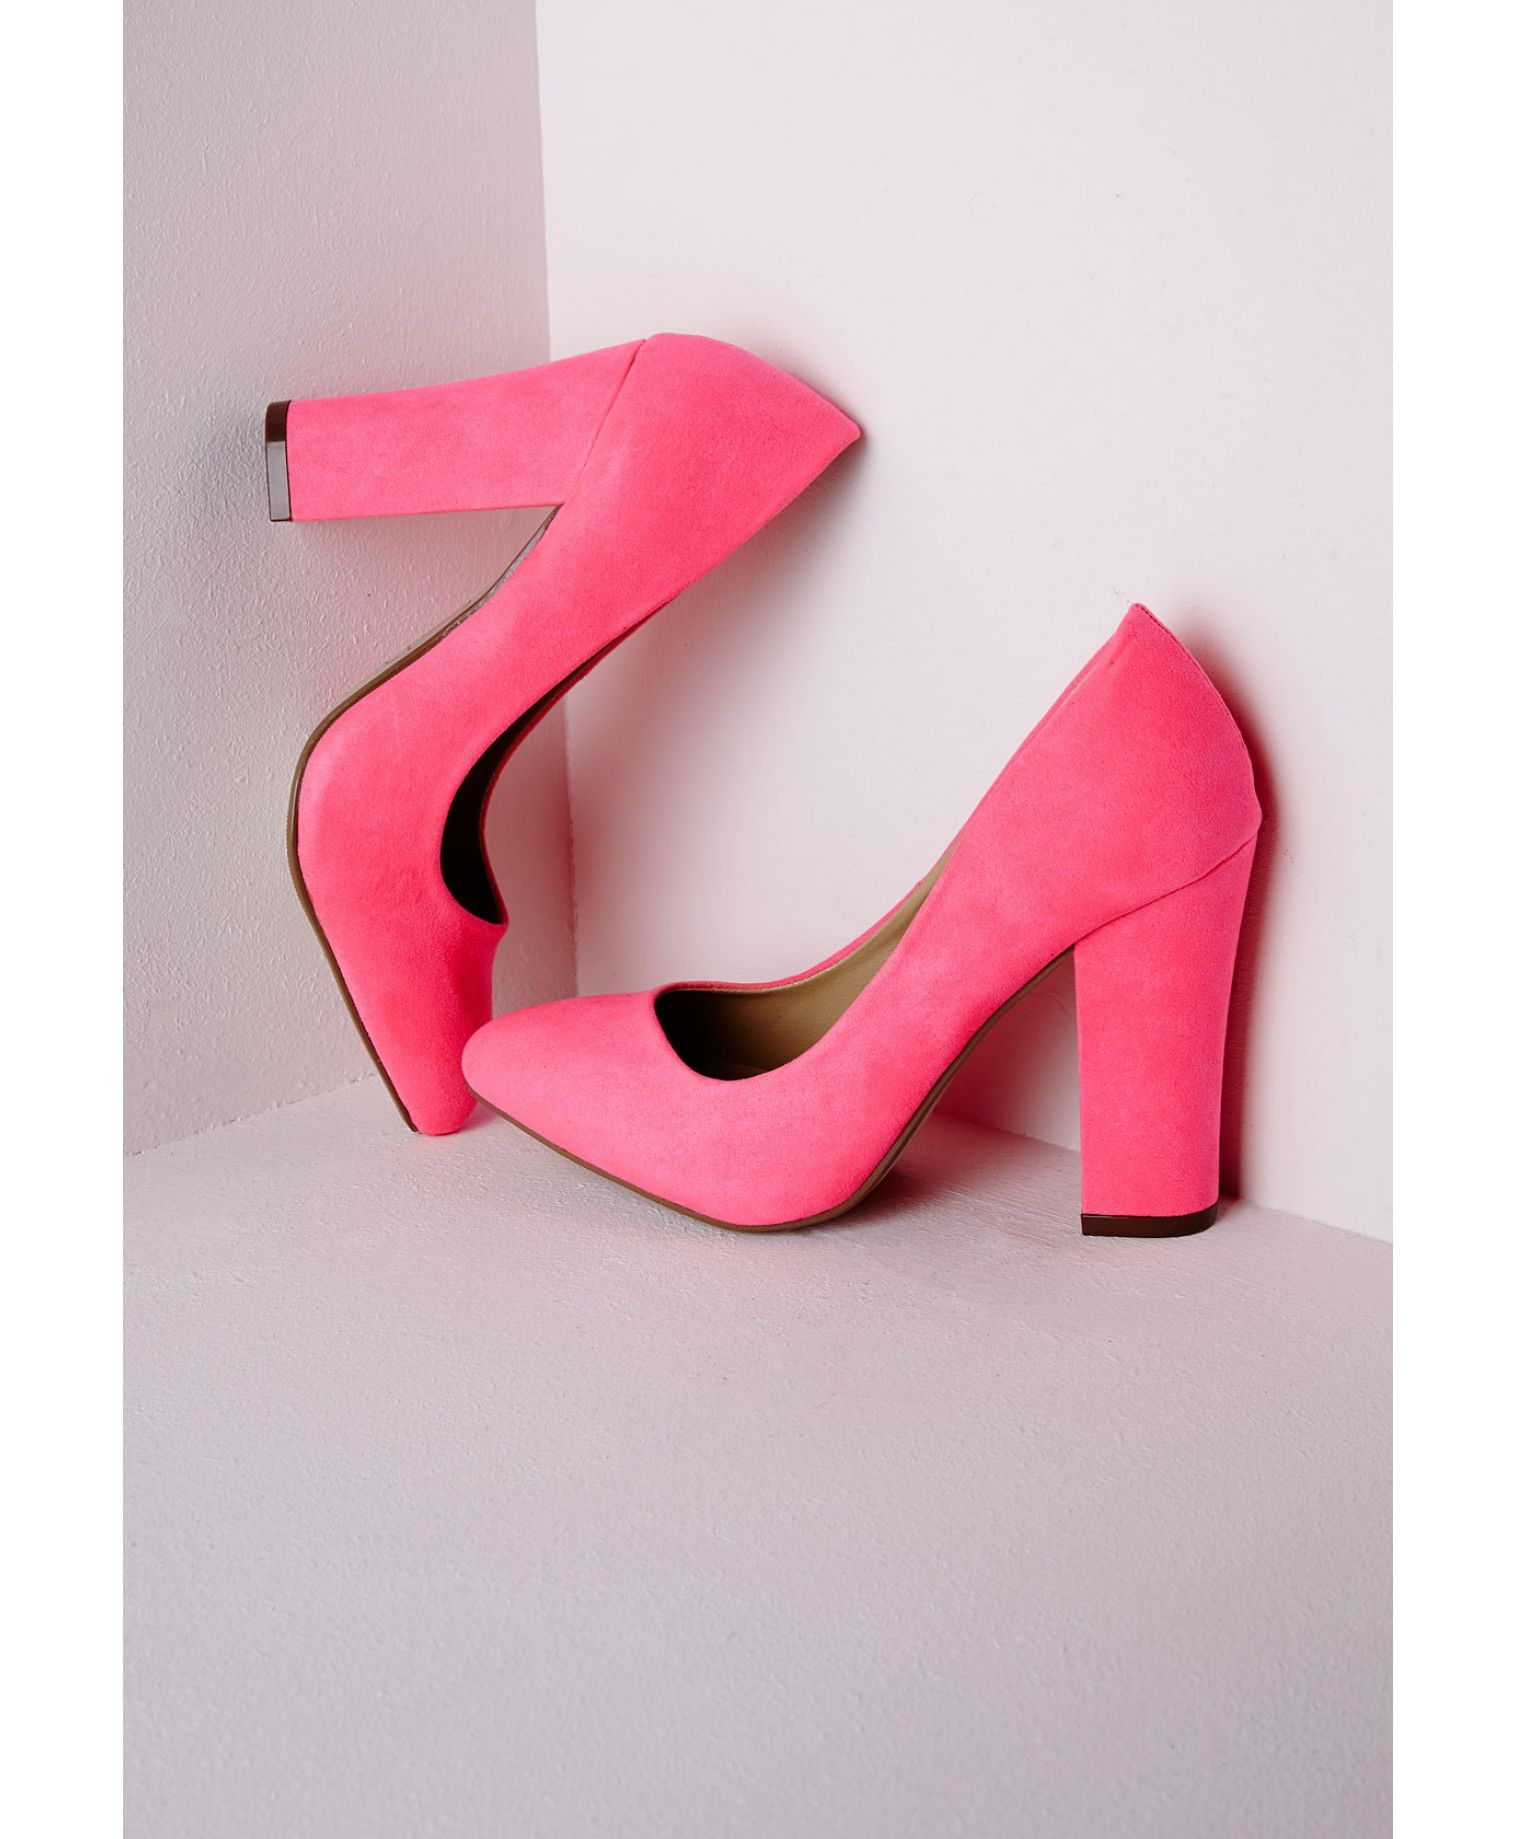 546260557fe Block Heel Court Shoes Neon Pink - Shoes - High Heels - Missguided ...